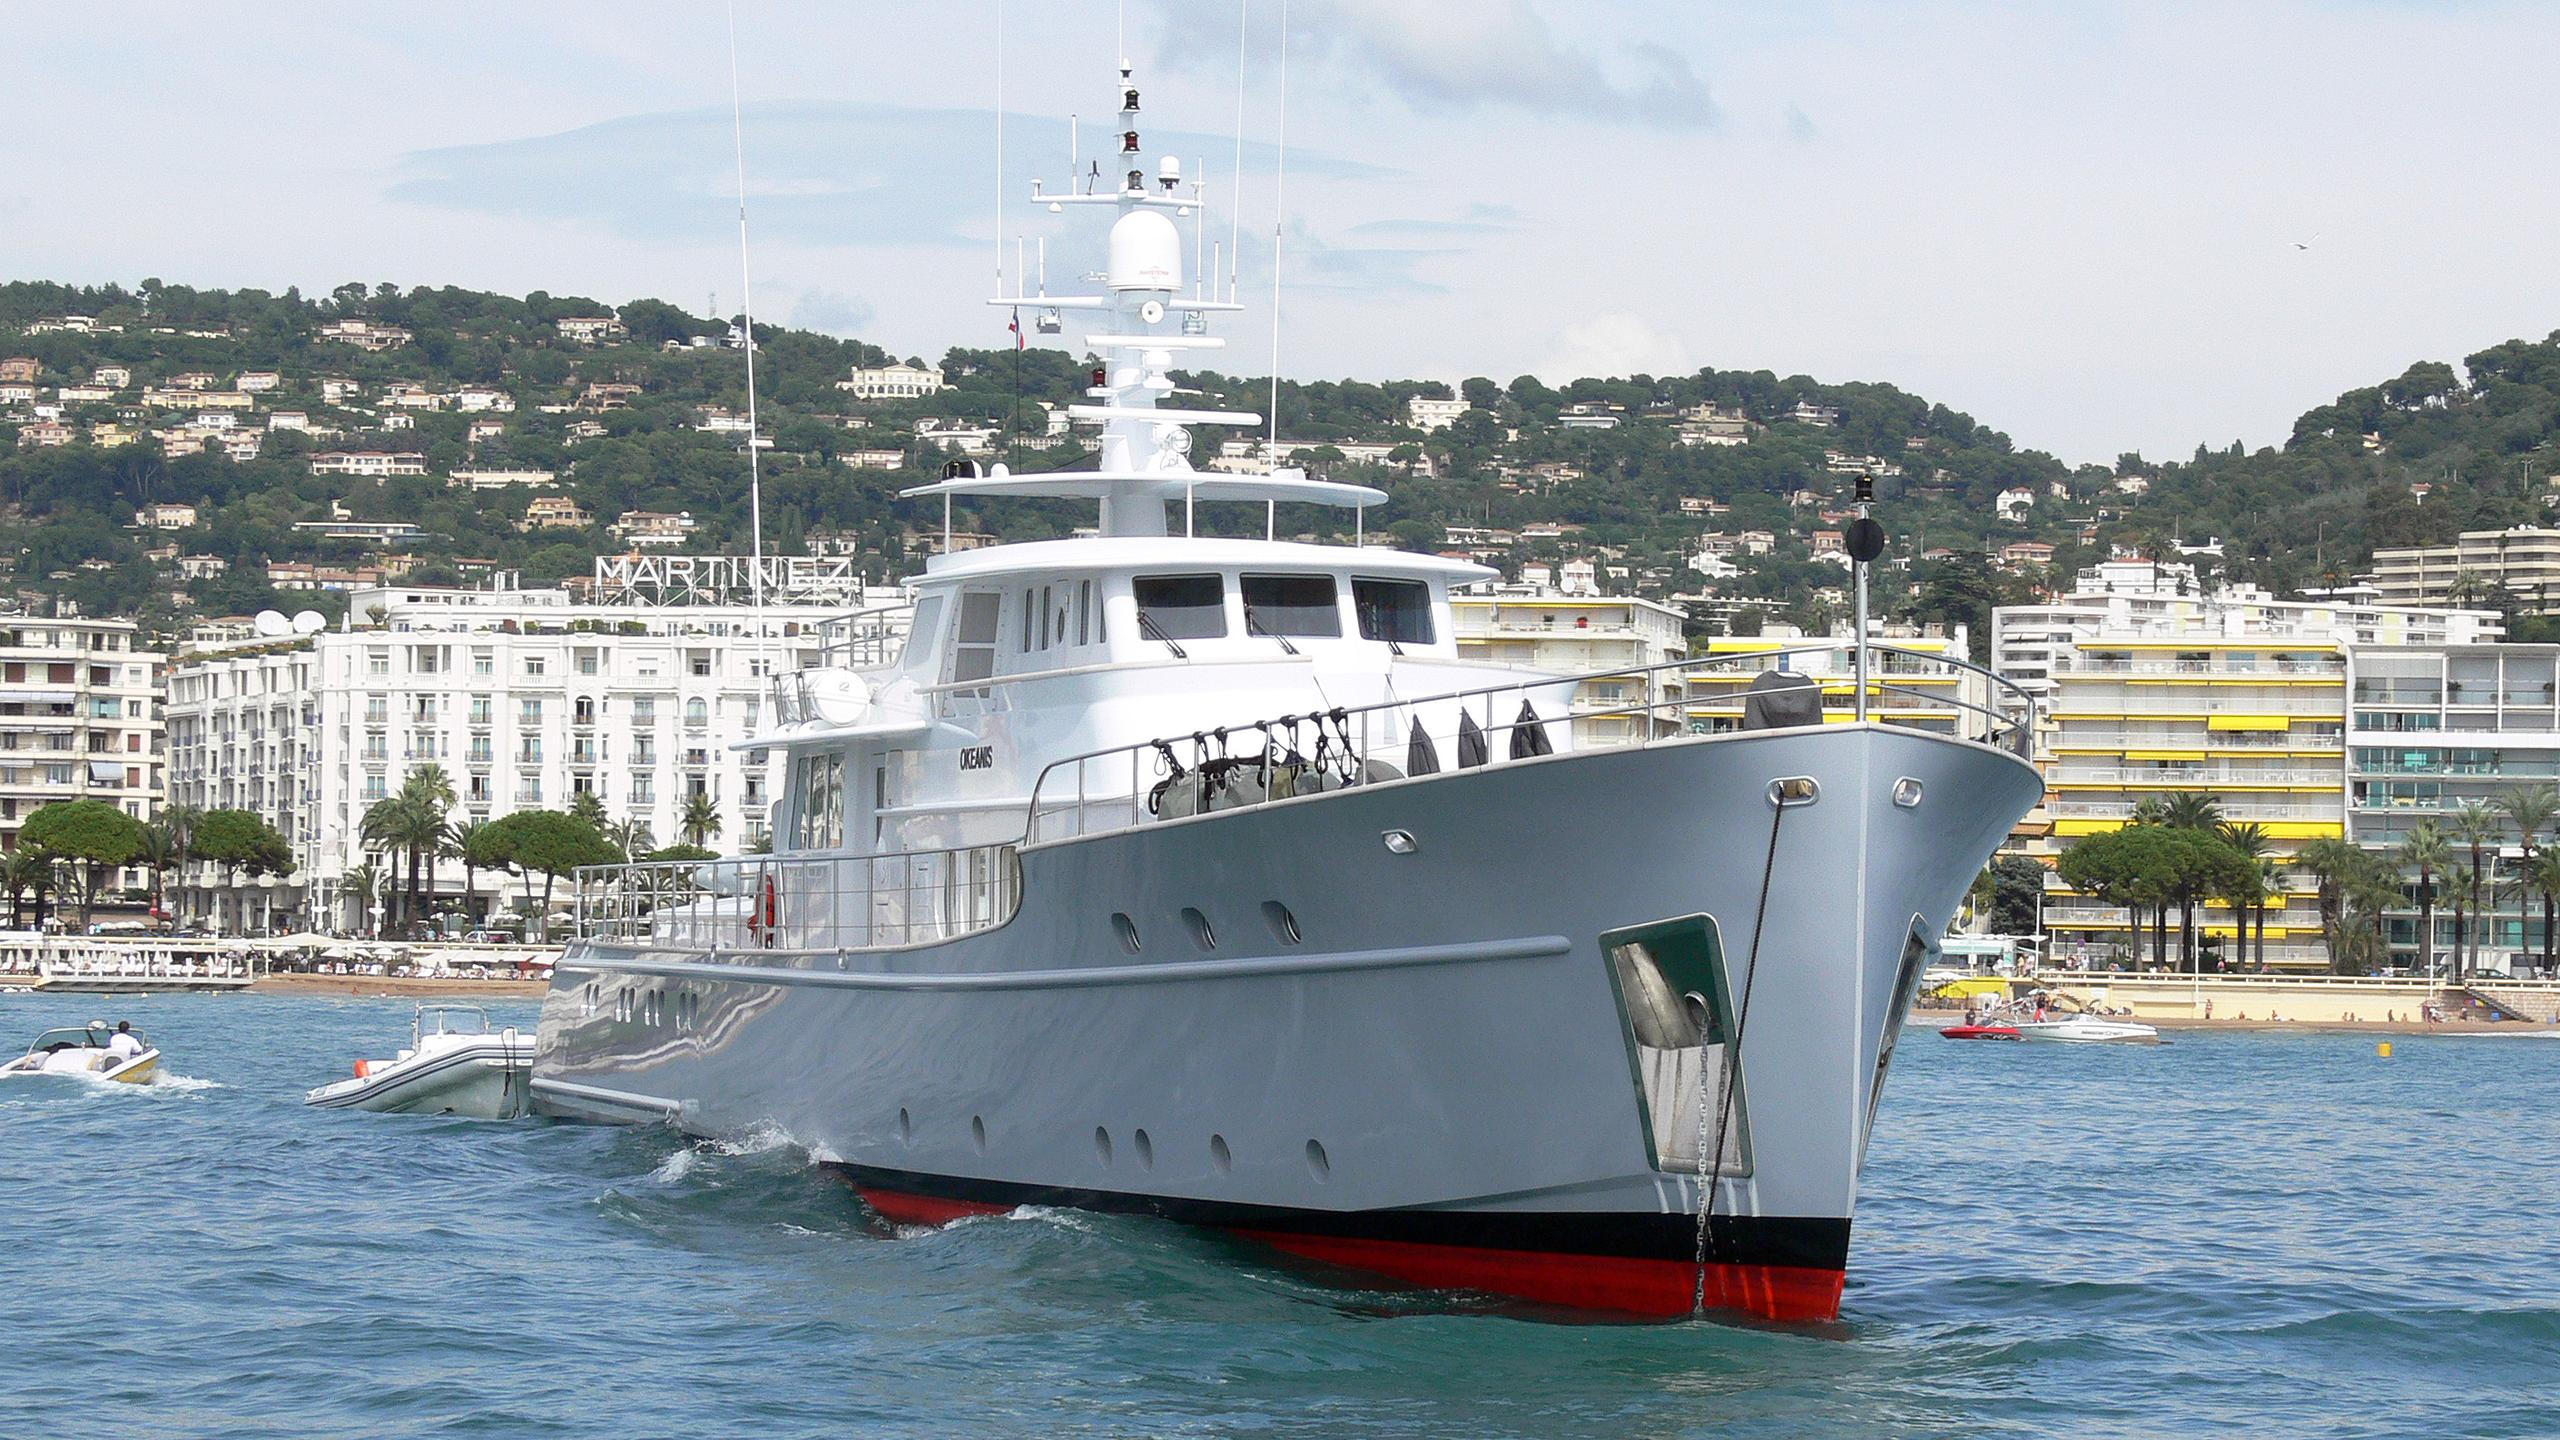 okeanis-motor-yacht-ocea-commuter-130-2003-40m-bow